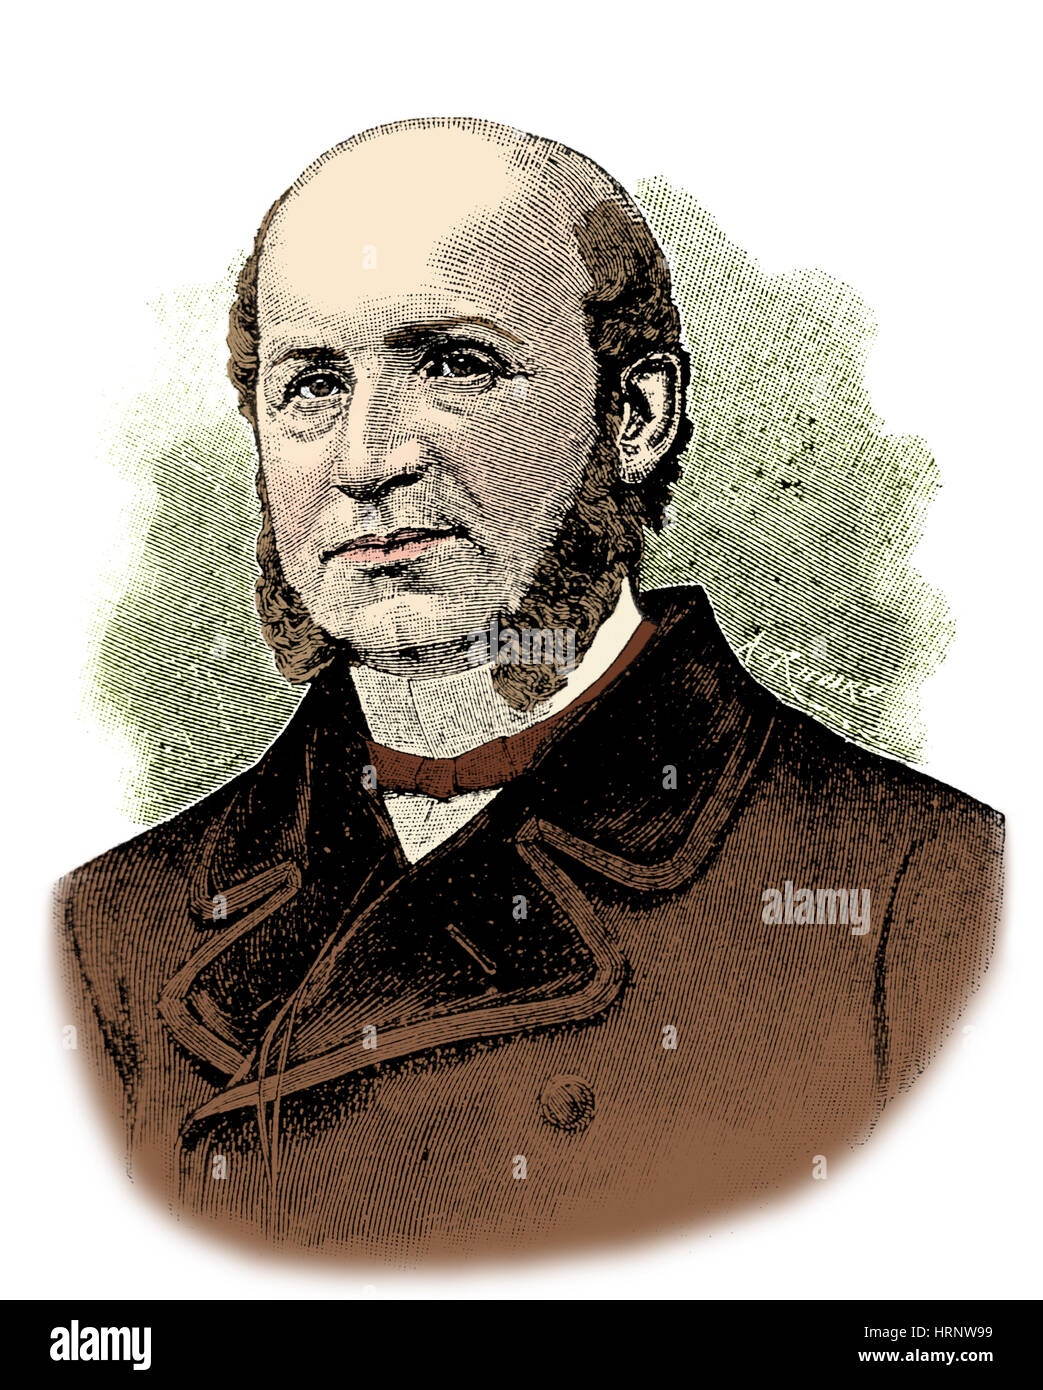 G.B.A. Duchenne, French Neurologist - Stock Image